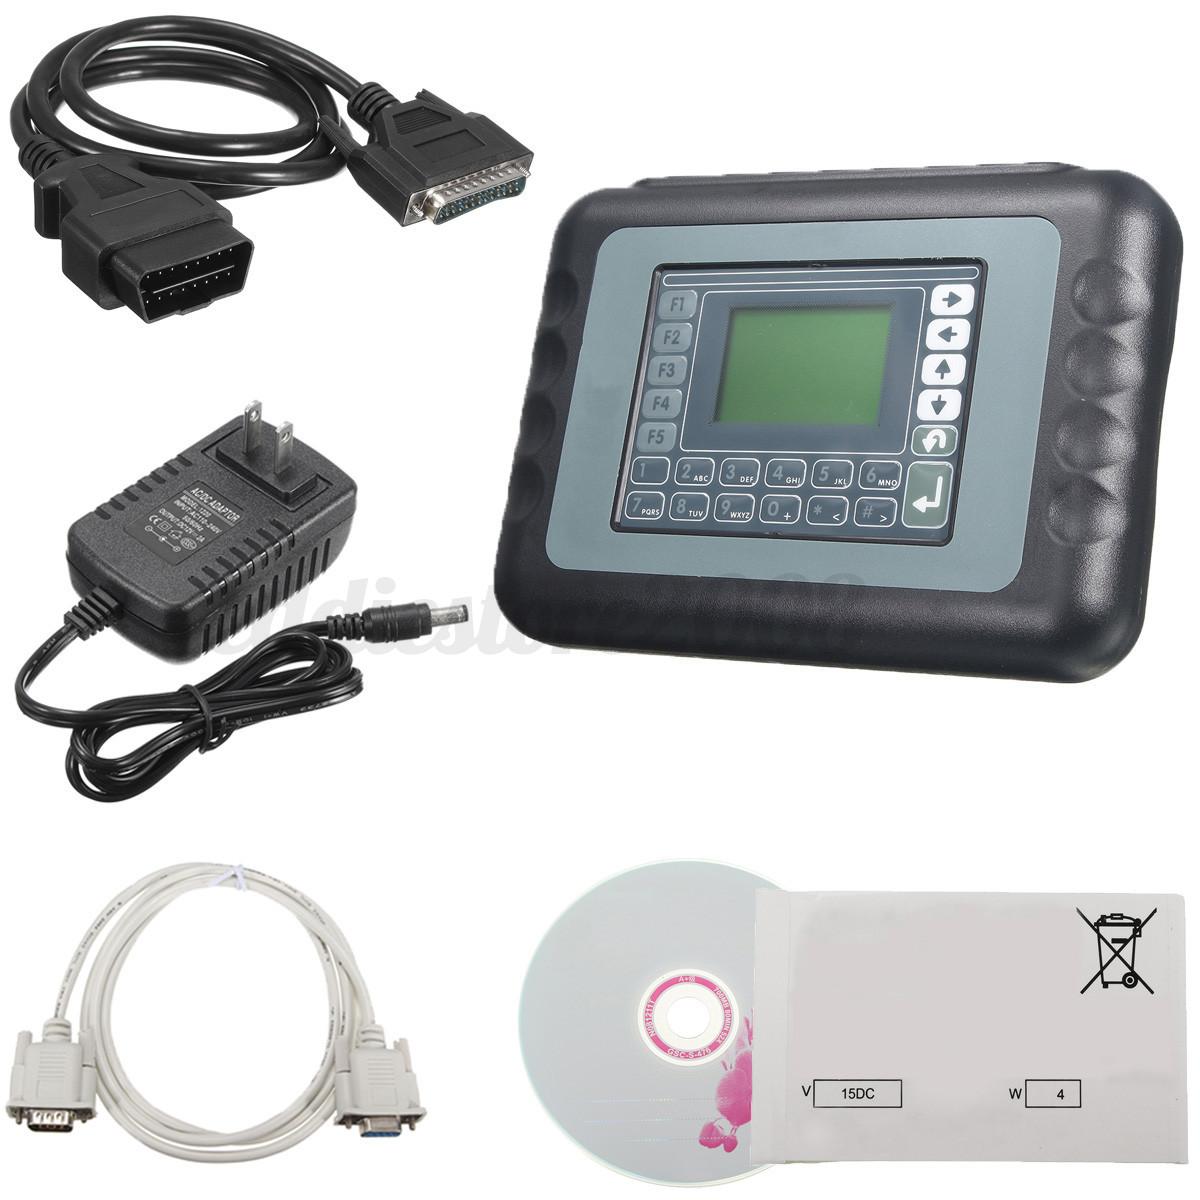 Automobile Sbb V33 02 Maker Universal Remote Car Programmer Multi Languages New For Sale In Hk